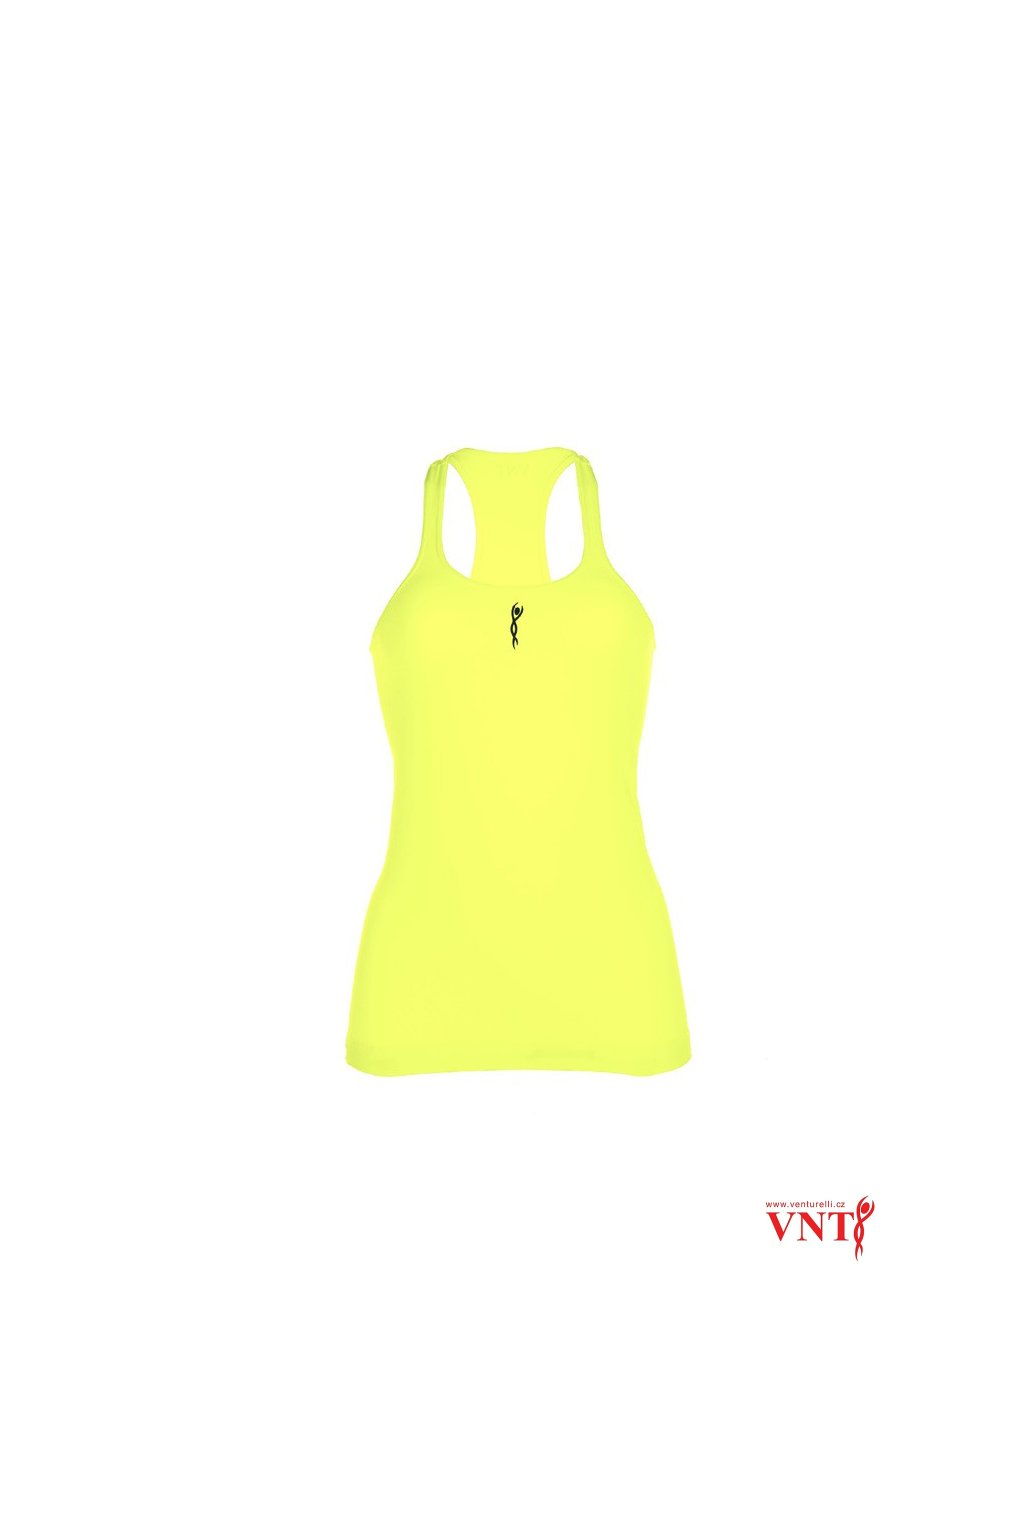 tílko venturelli žluta neon přední 06CA16F18